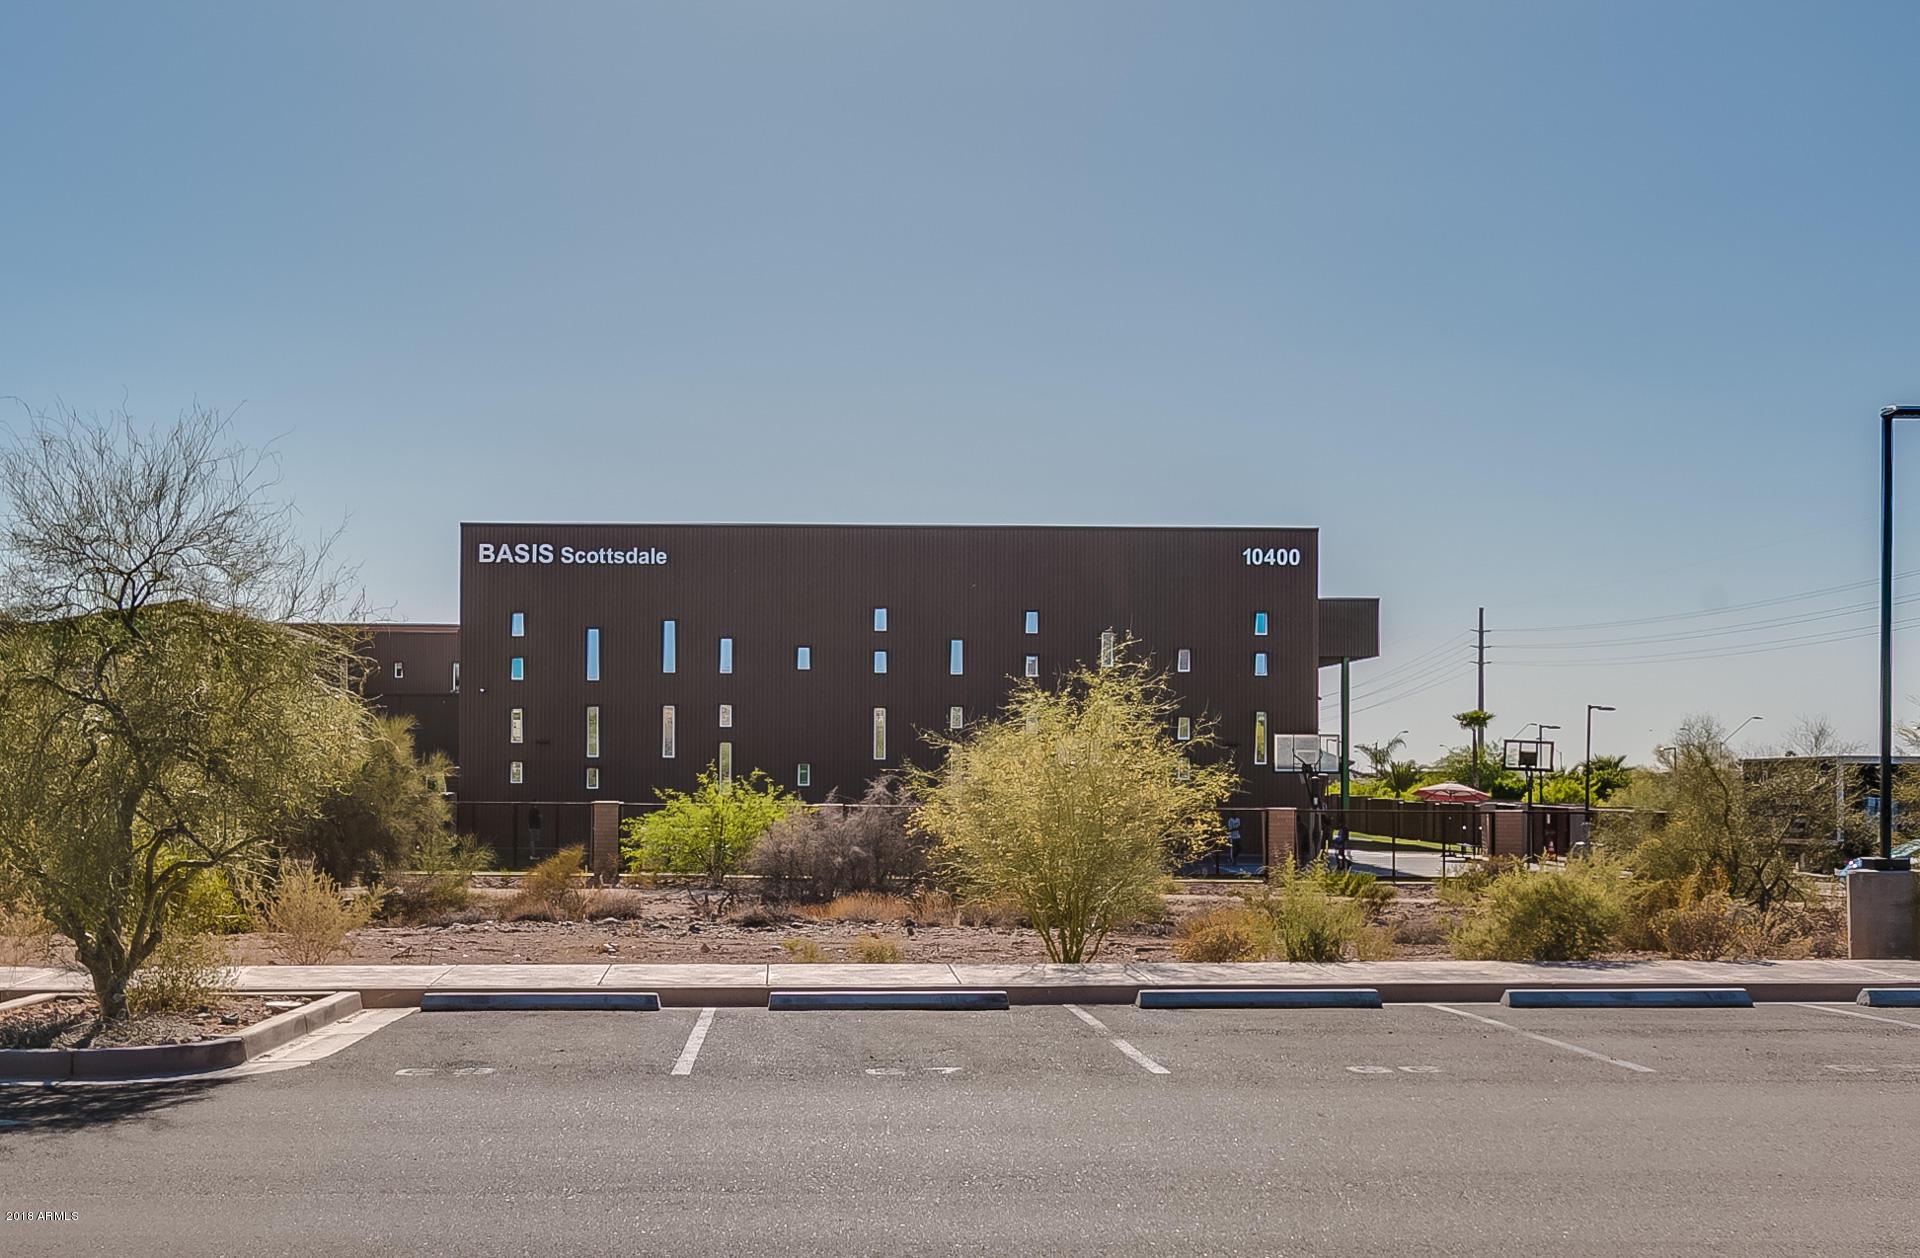 MLS 5765069 13101 E Cochise Road, Scottsdale, AZ 85259 Scottsdale AZ Metes And Bounds